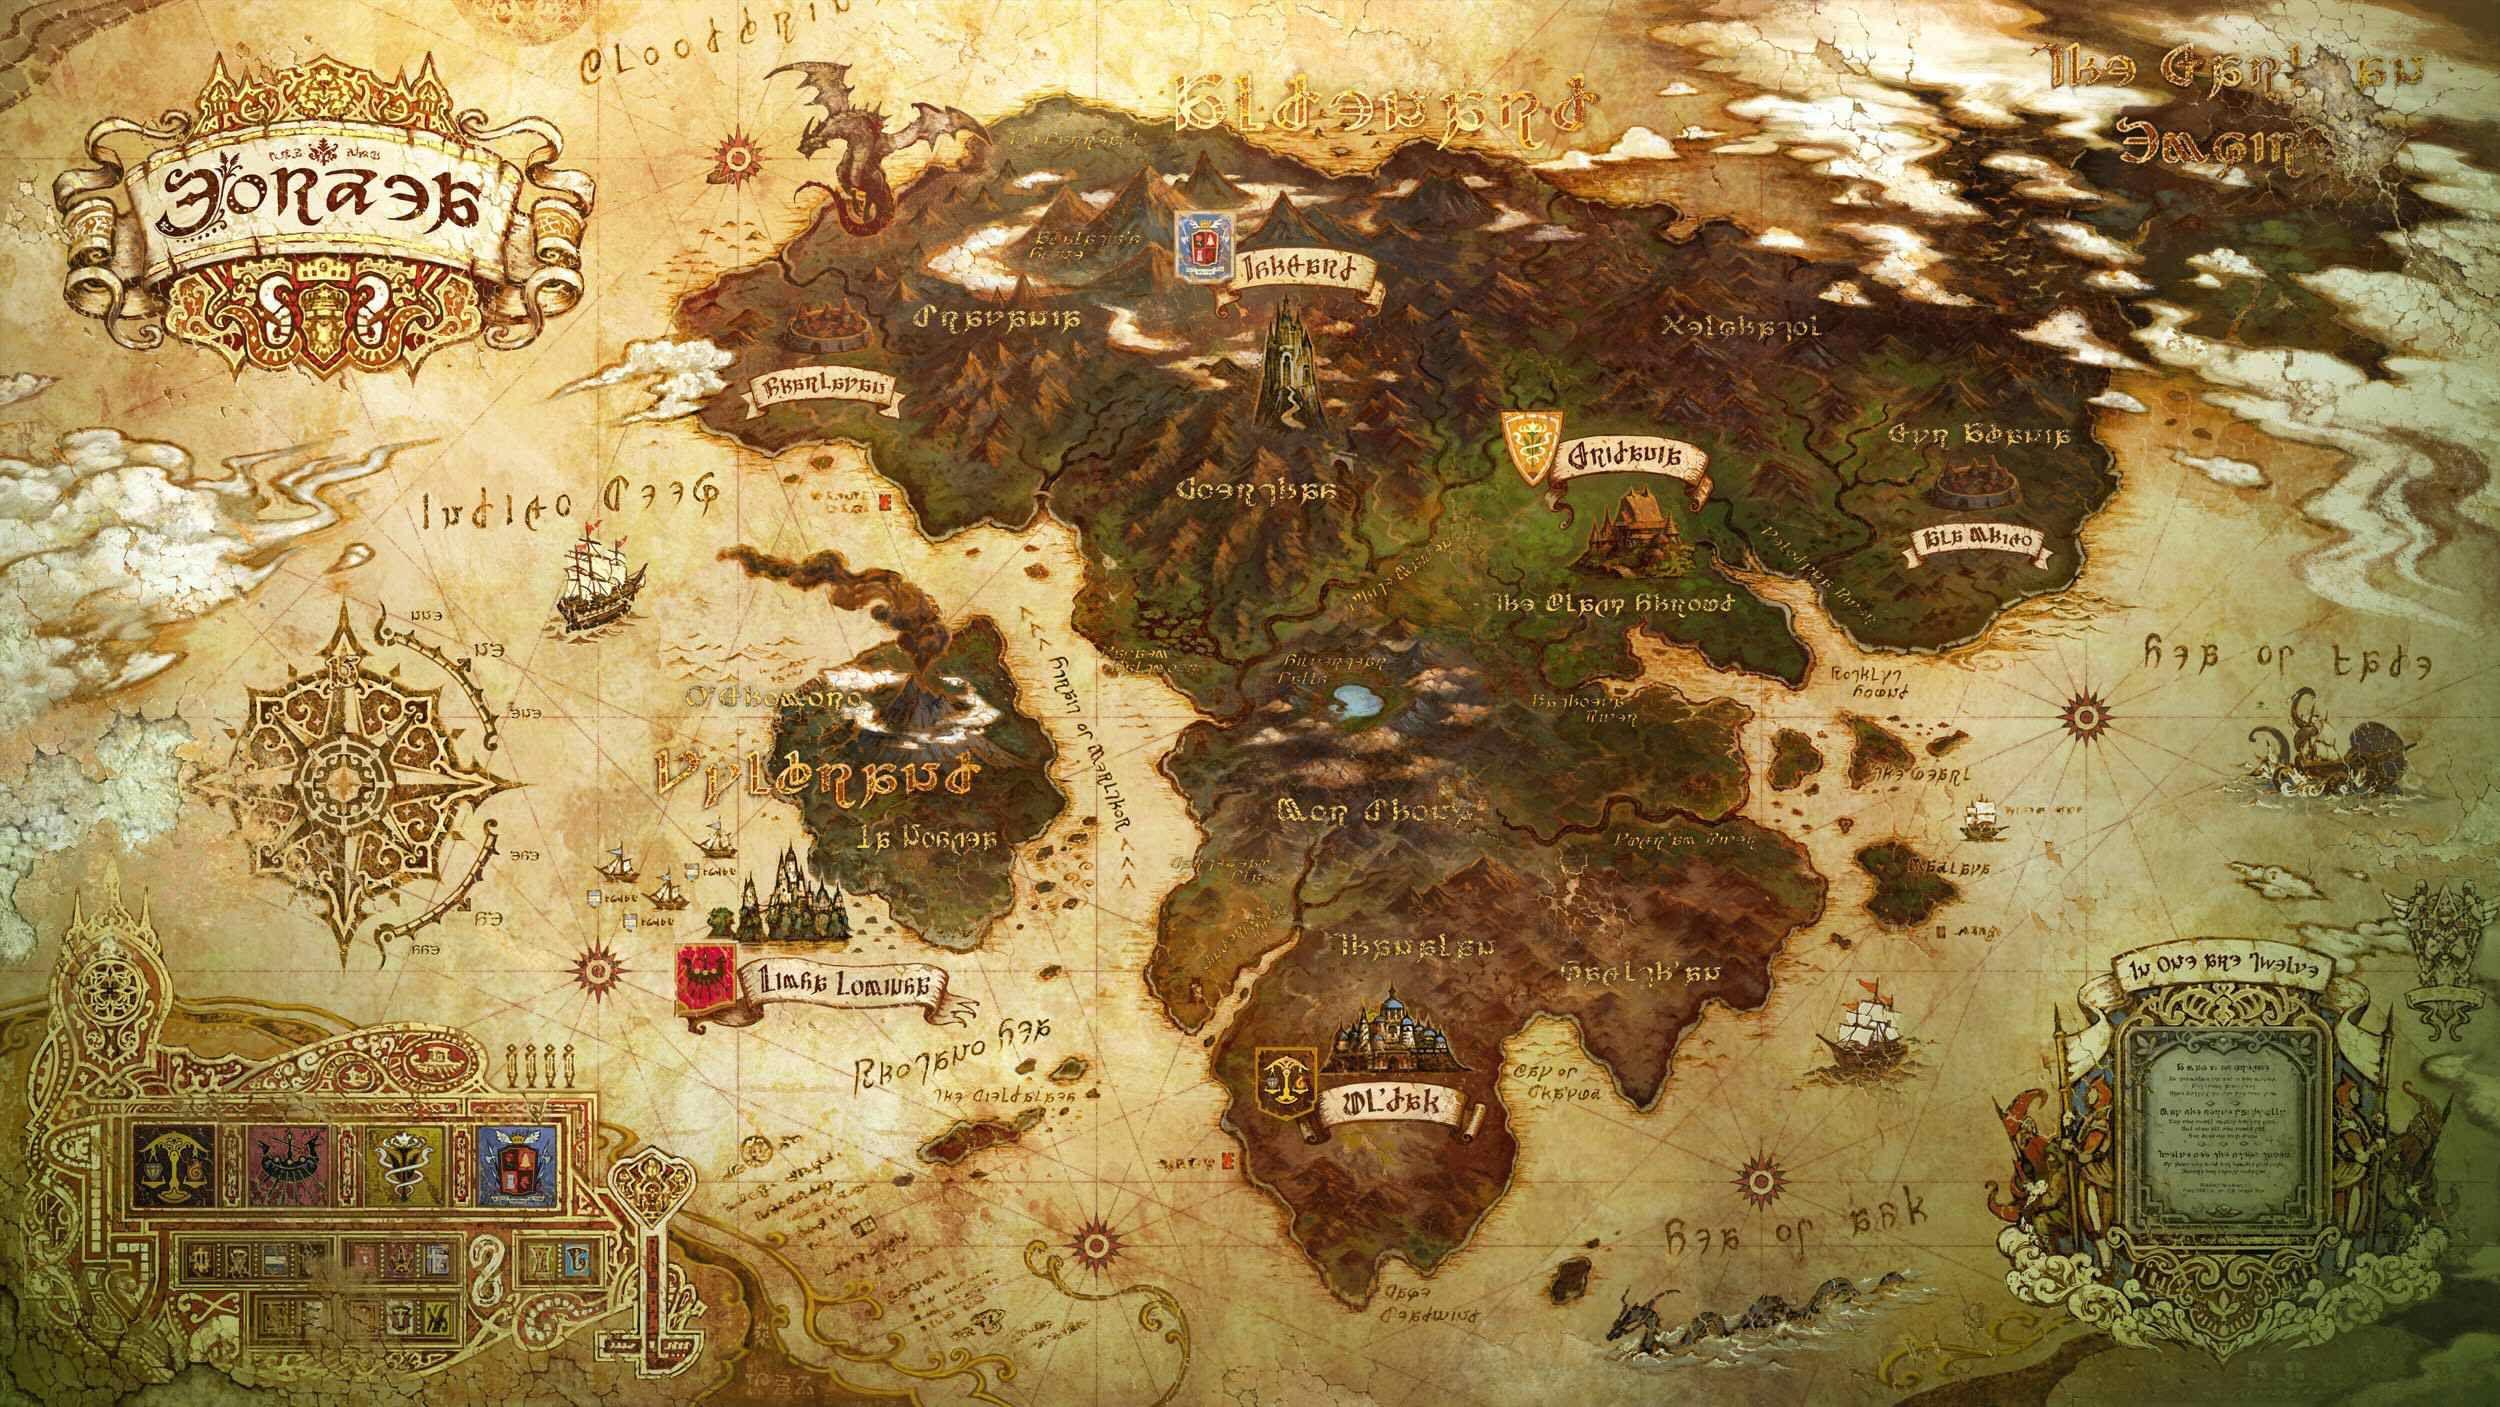 Ffxiv maps eorzea region uneditedg 25001407 map fantasy world map gumiabroncs Choice Image